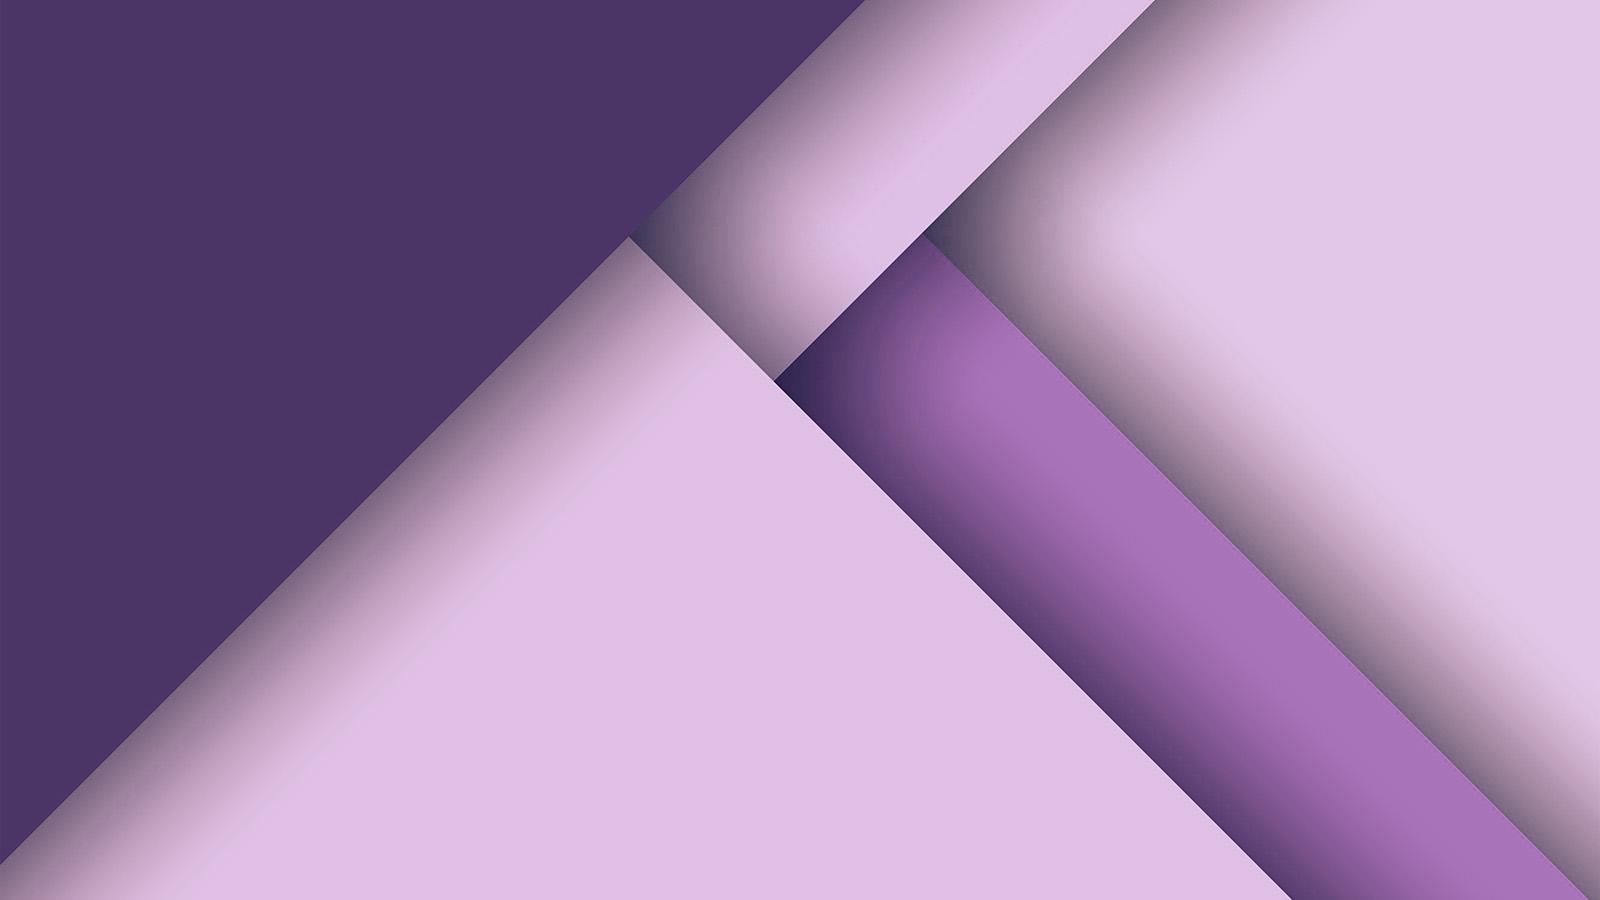 Fall Iphone 7 Plus Wallpaper Vk87 Lollipop Background Purple Flat Material Pattern